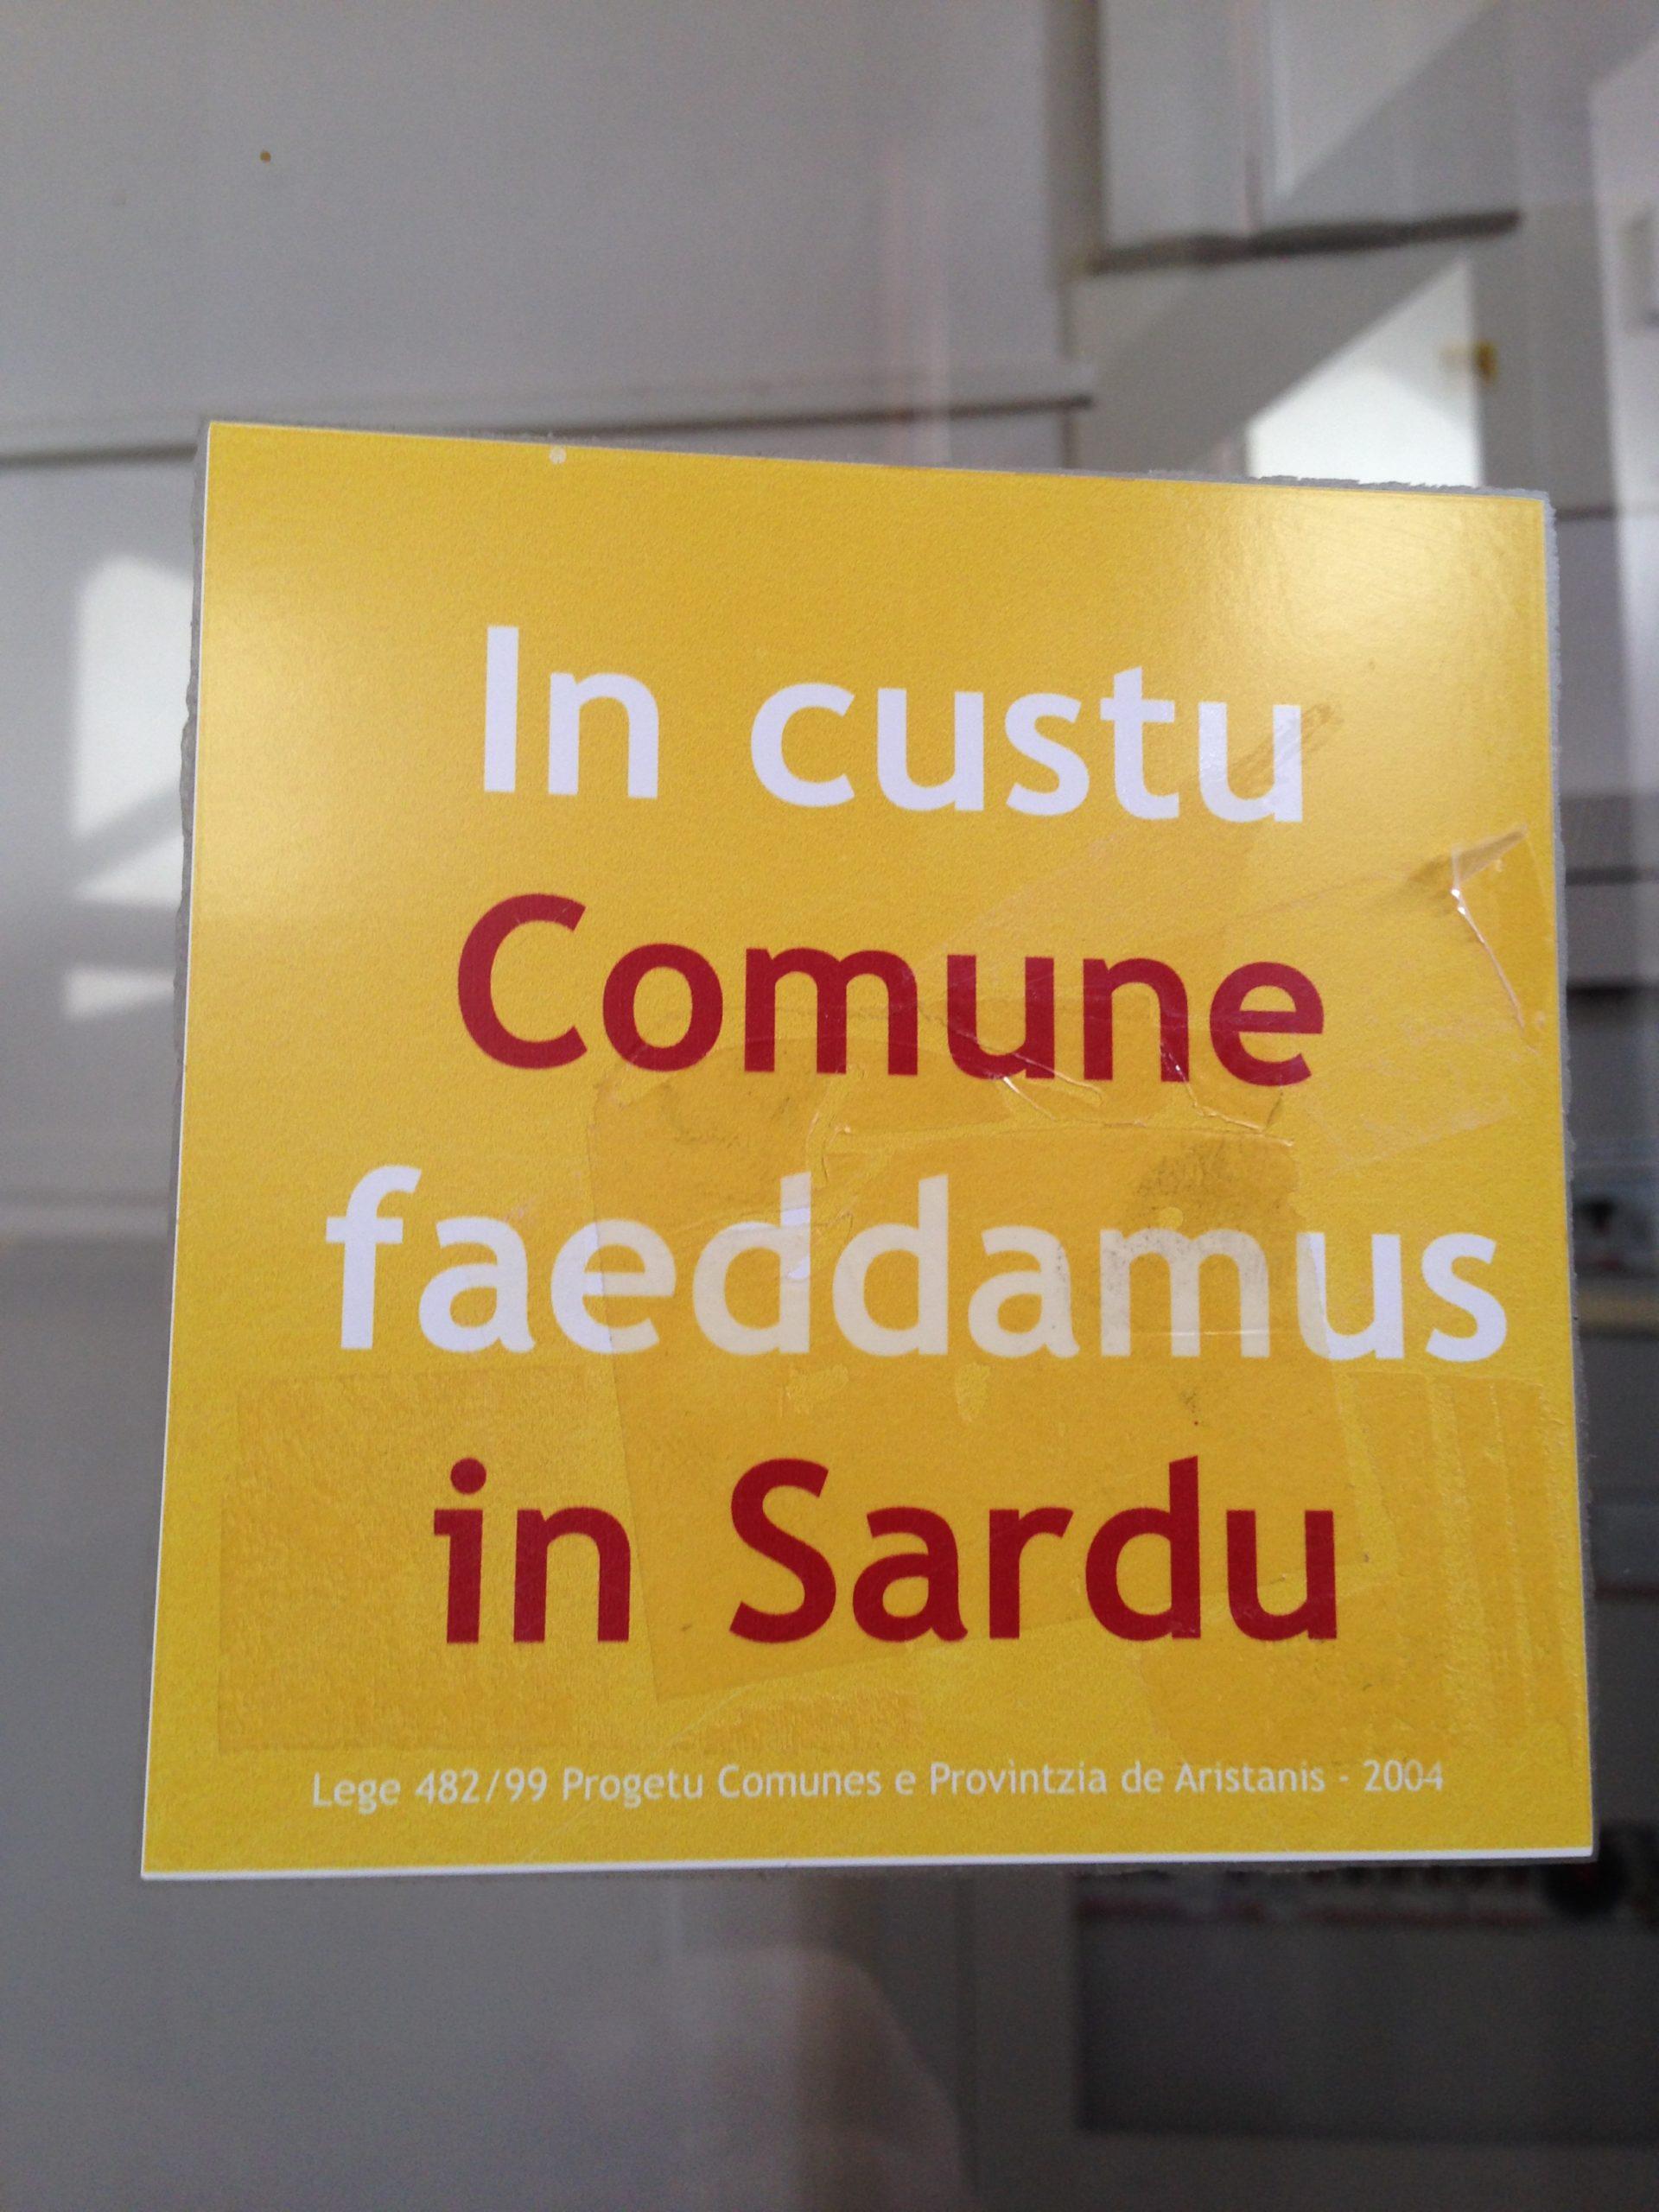 Chie no iscriet in istandard faghet folclore, non limba